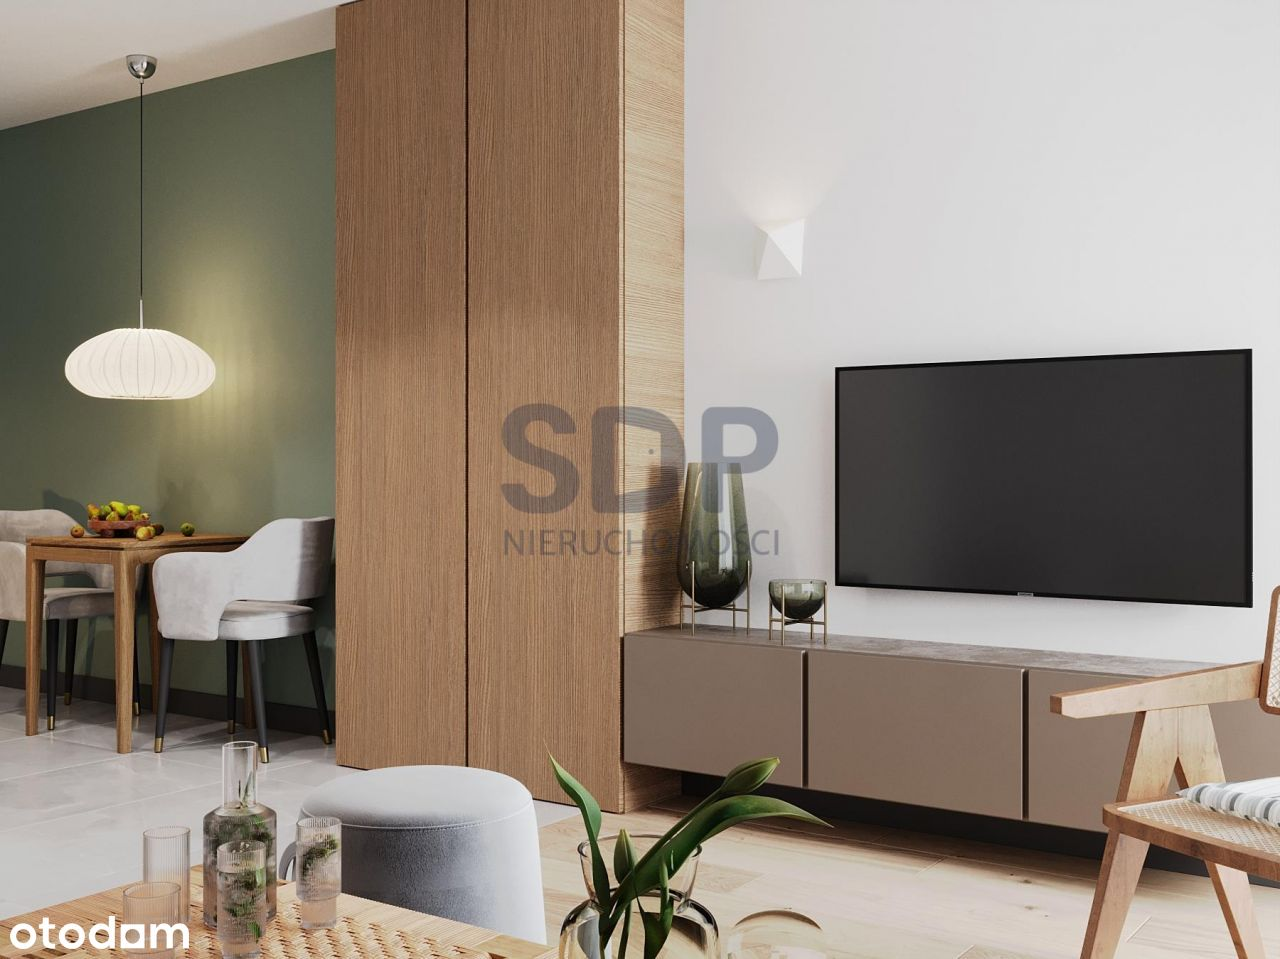 apartament na 6 piętrze; za 281026 pln